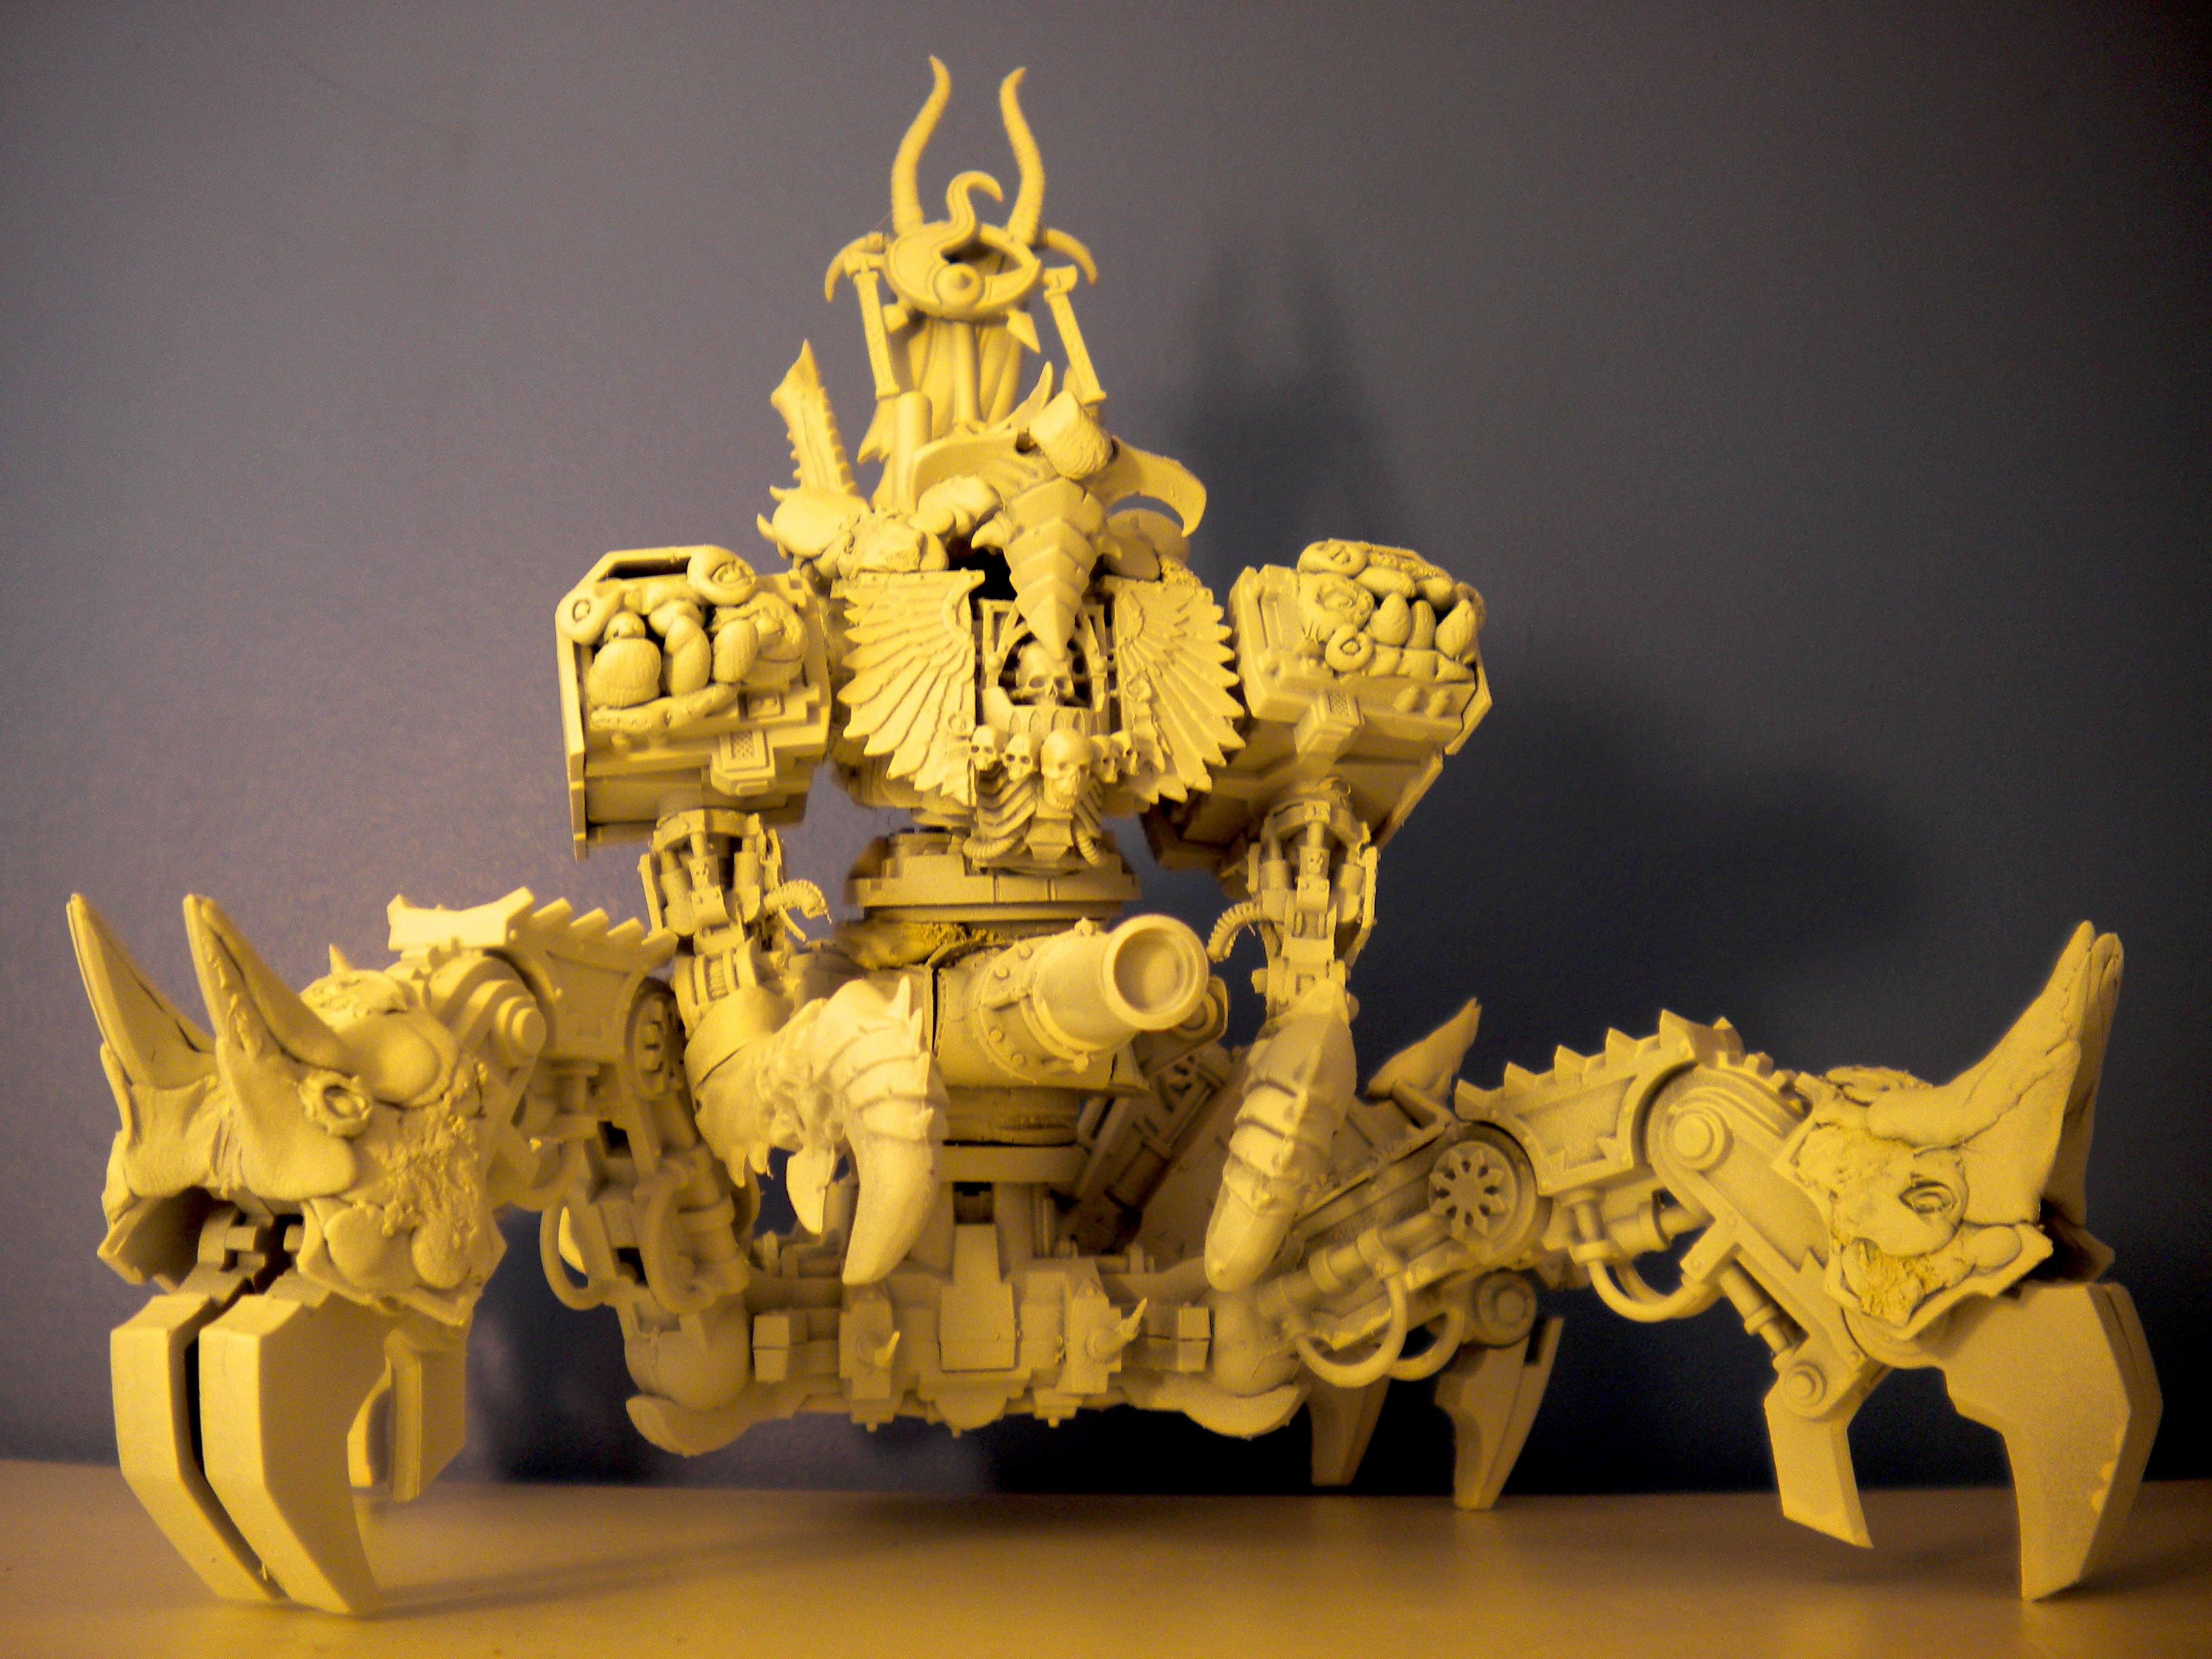 Bio Mechanical, Chaos, Chaos Army, Chaos Rhino, Chaos Space Marines, Conversion, Daemon Prince, Defiler, Nurgle, Nurgle Army, Painted Chaos, Plague Marines, Thousand Sons, Tzeentch